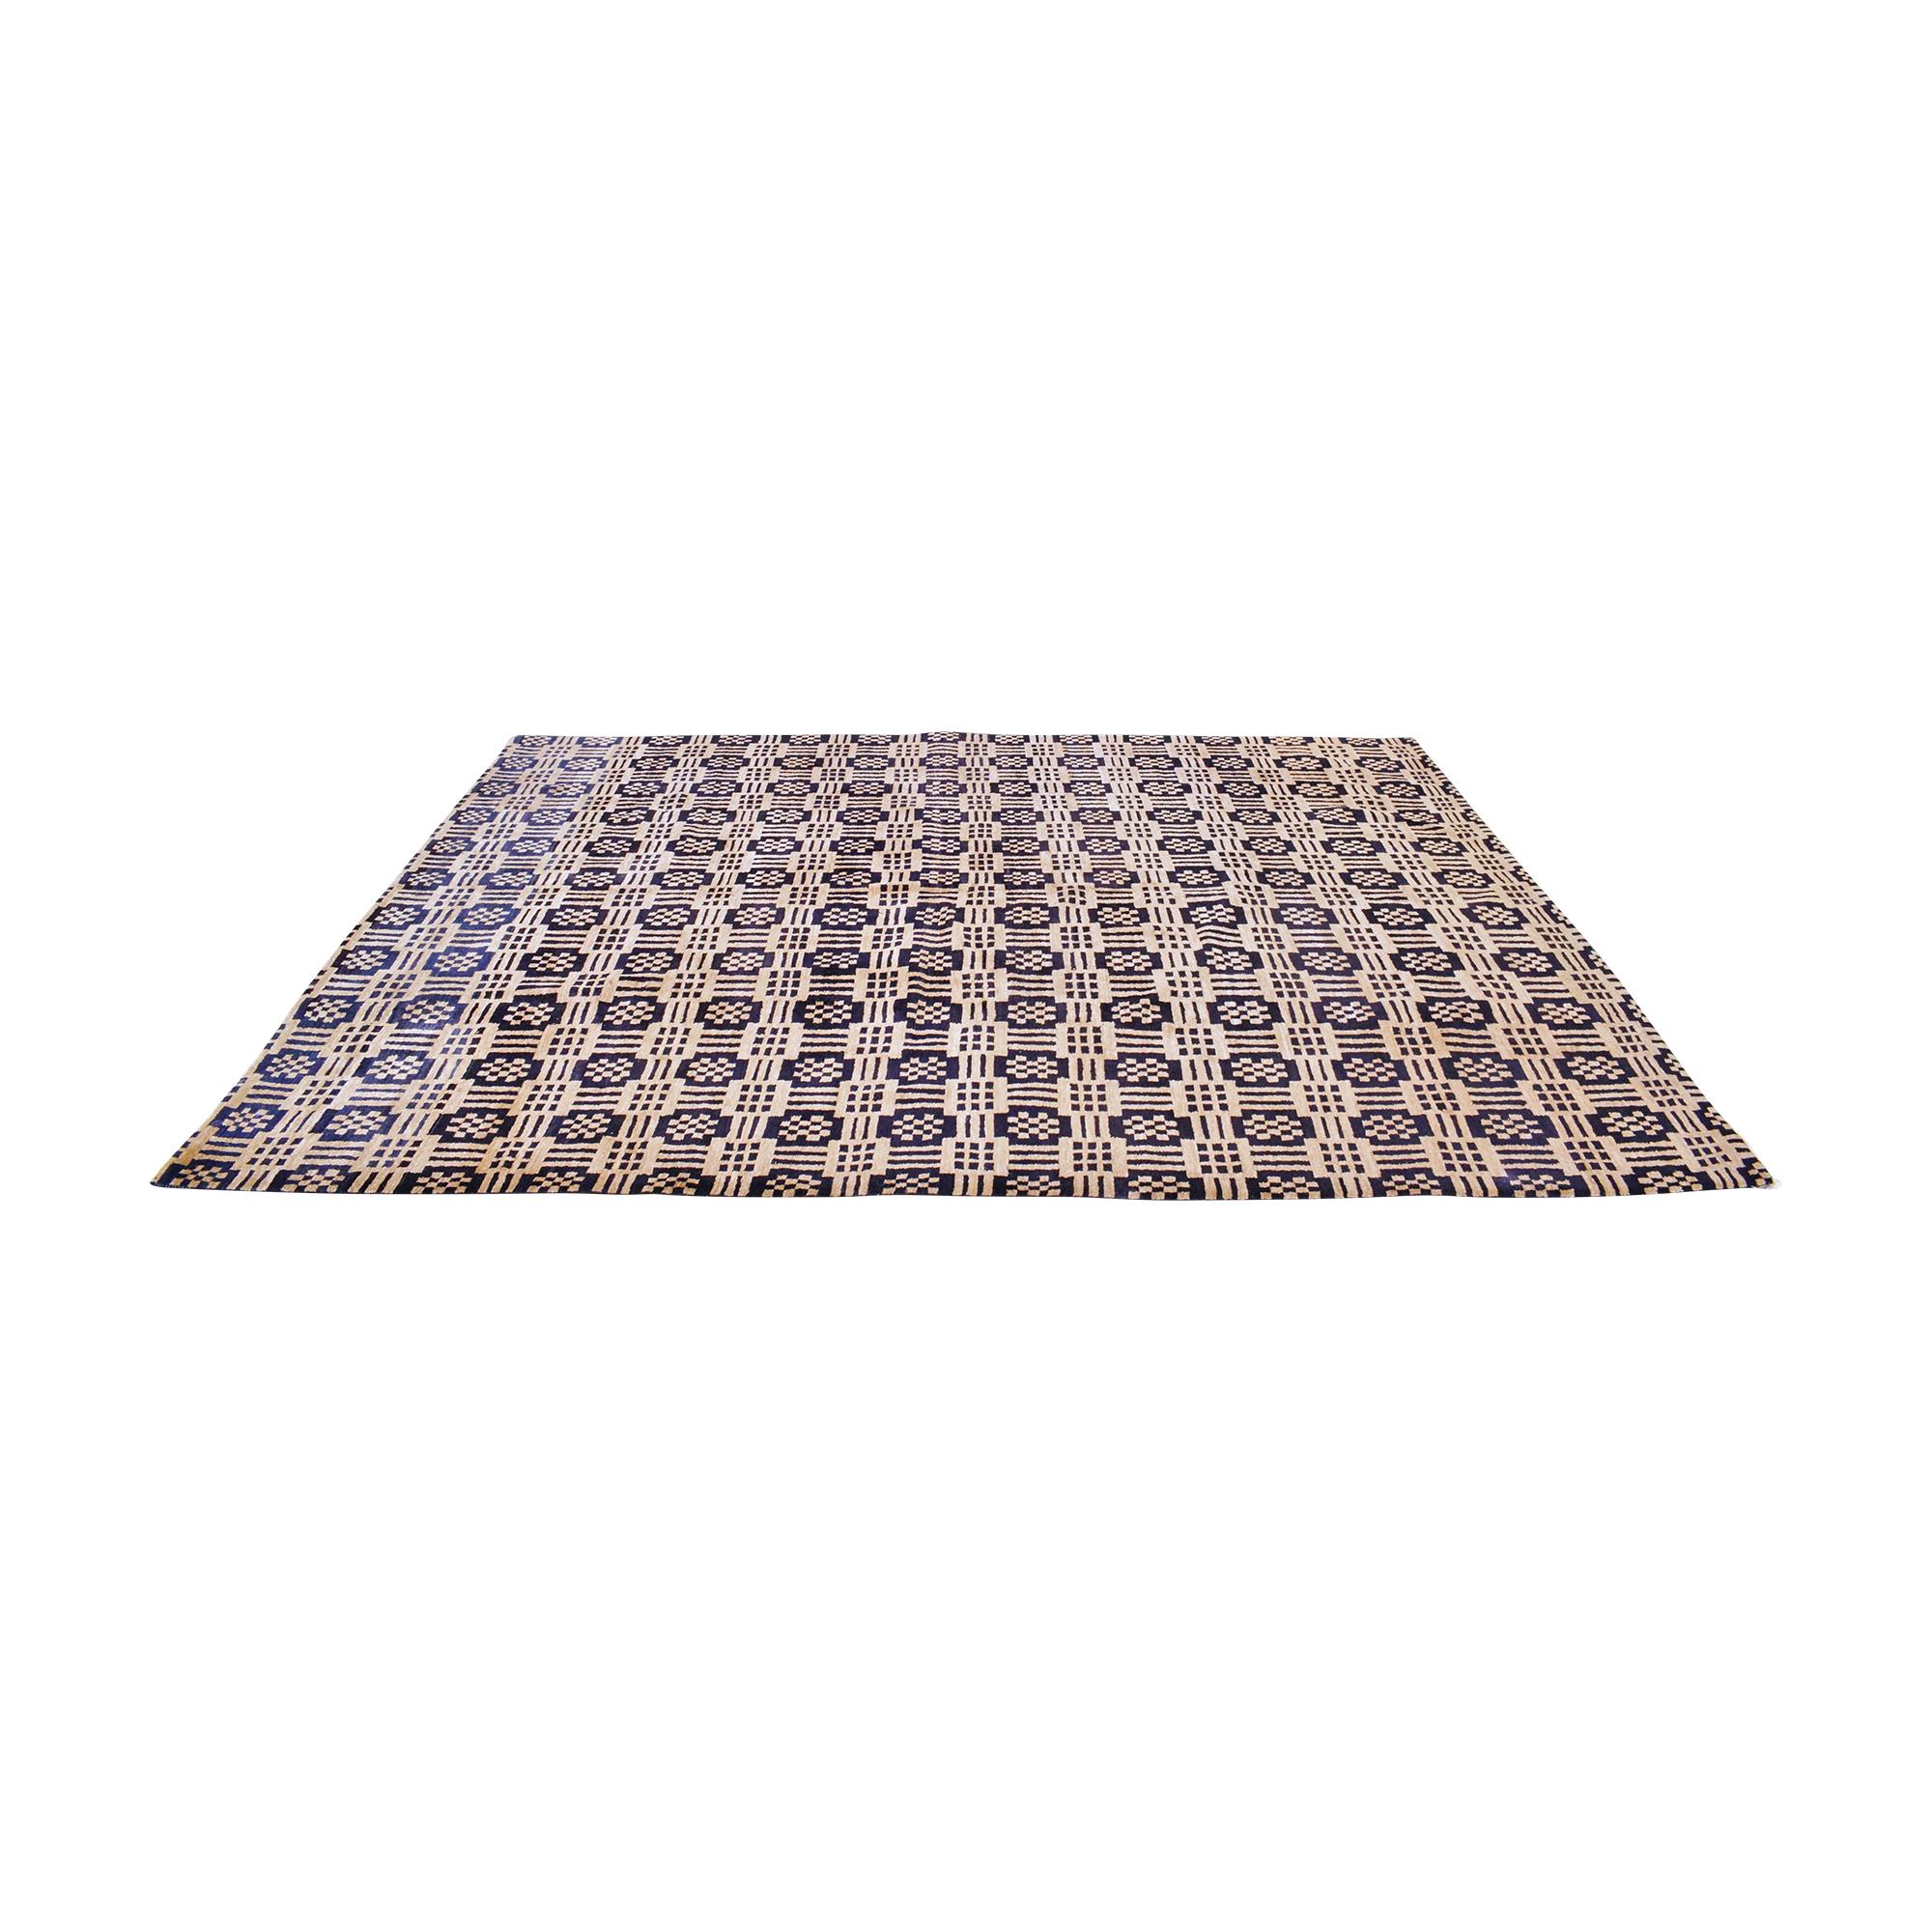 Knecht Ag Knecht Ag via ABC Carpet & Home Patterned Area Rug Rugs